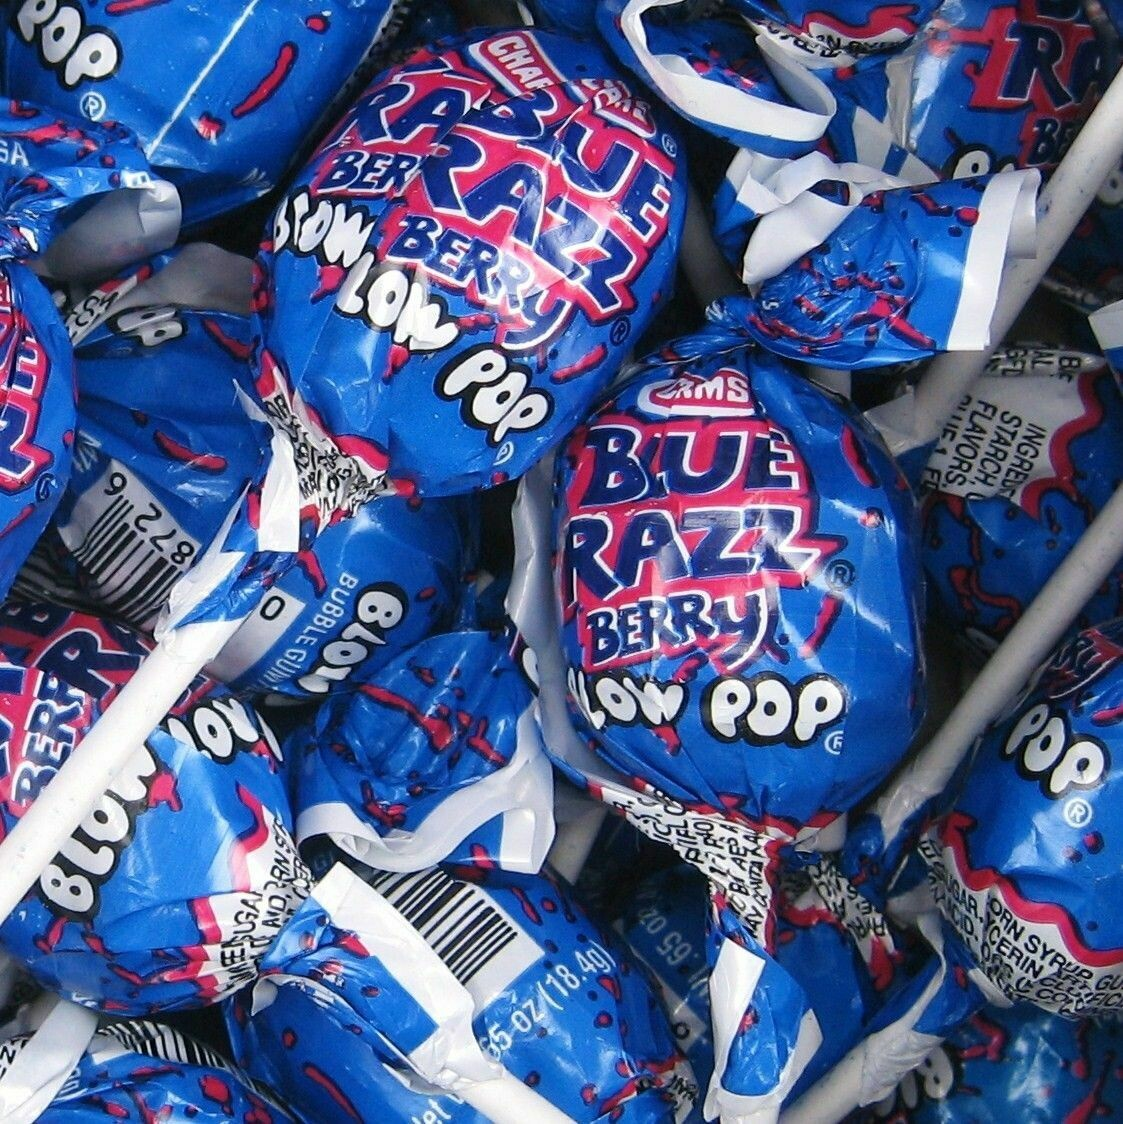 Blow Pop Blue Razz 48ct